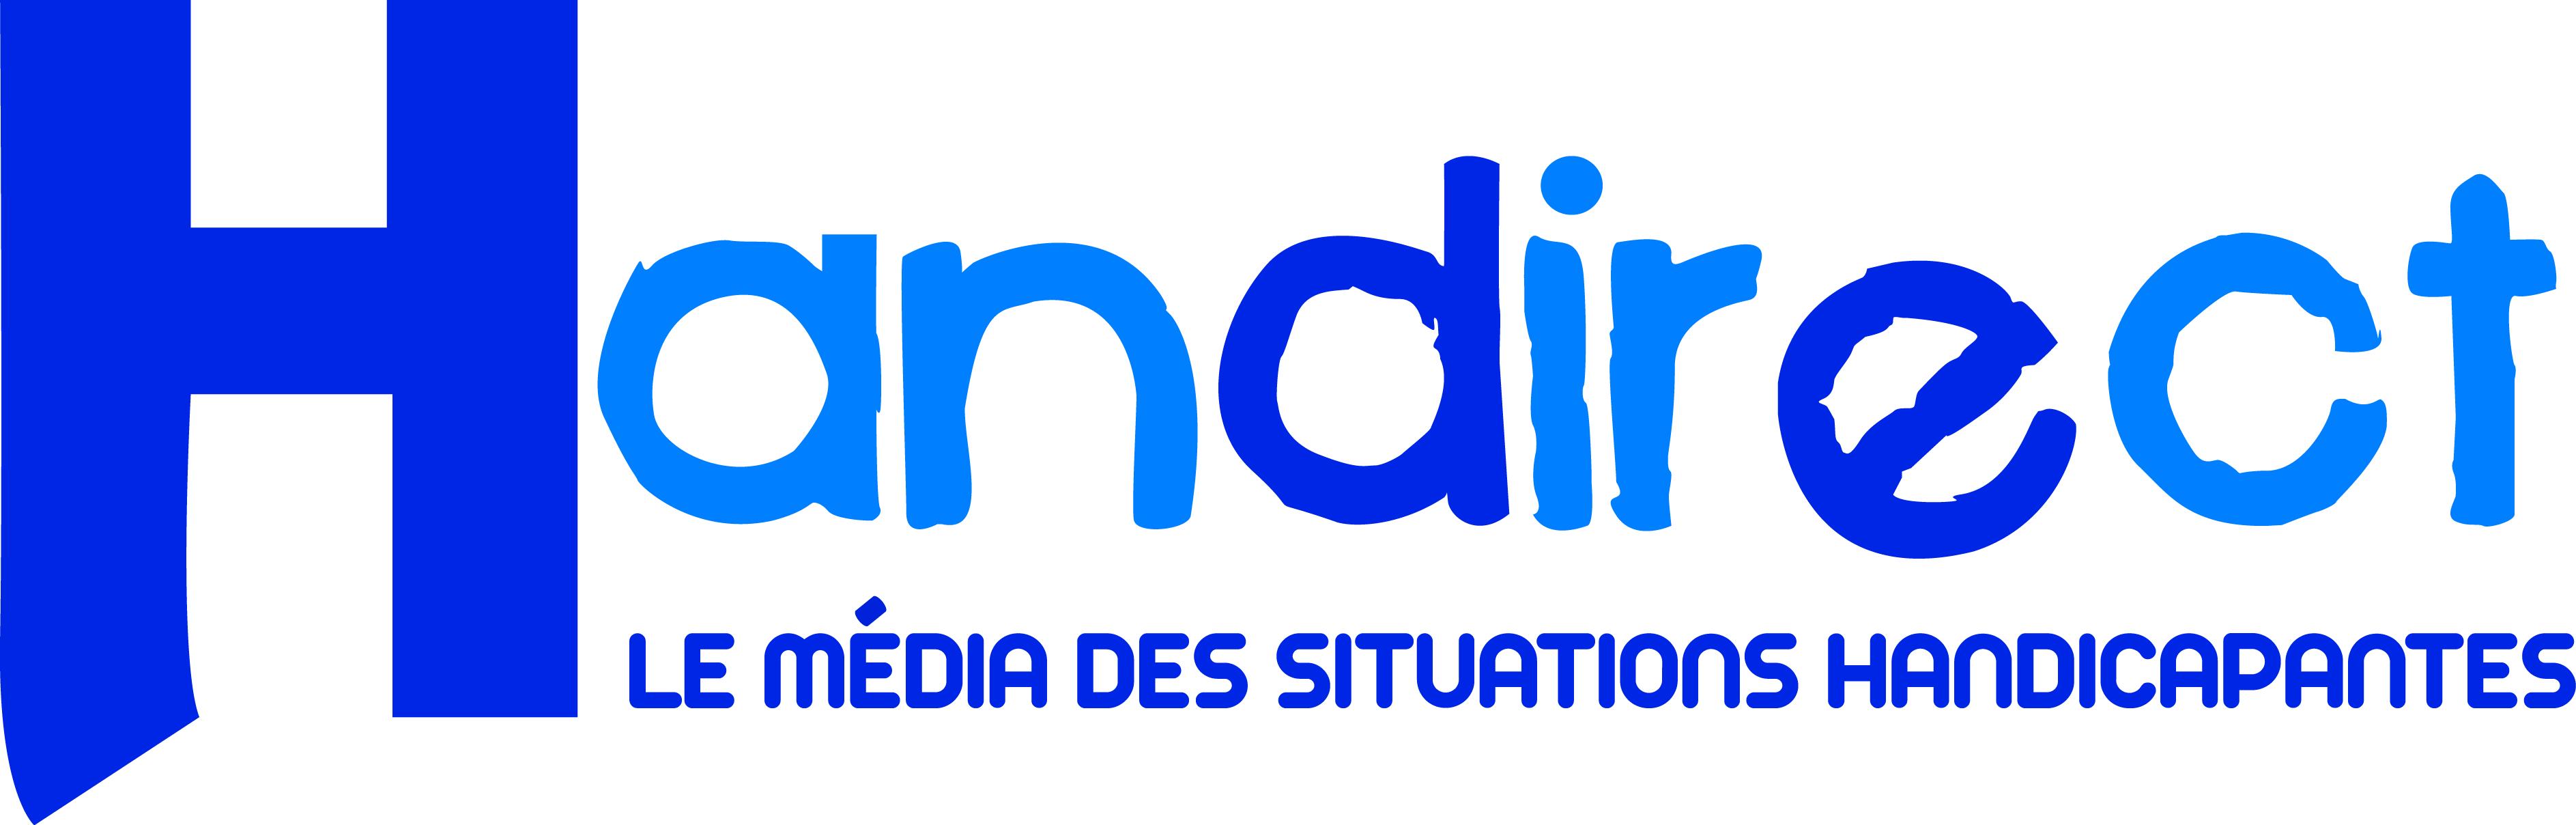 logo de Handirect